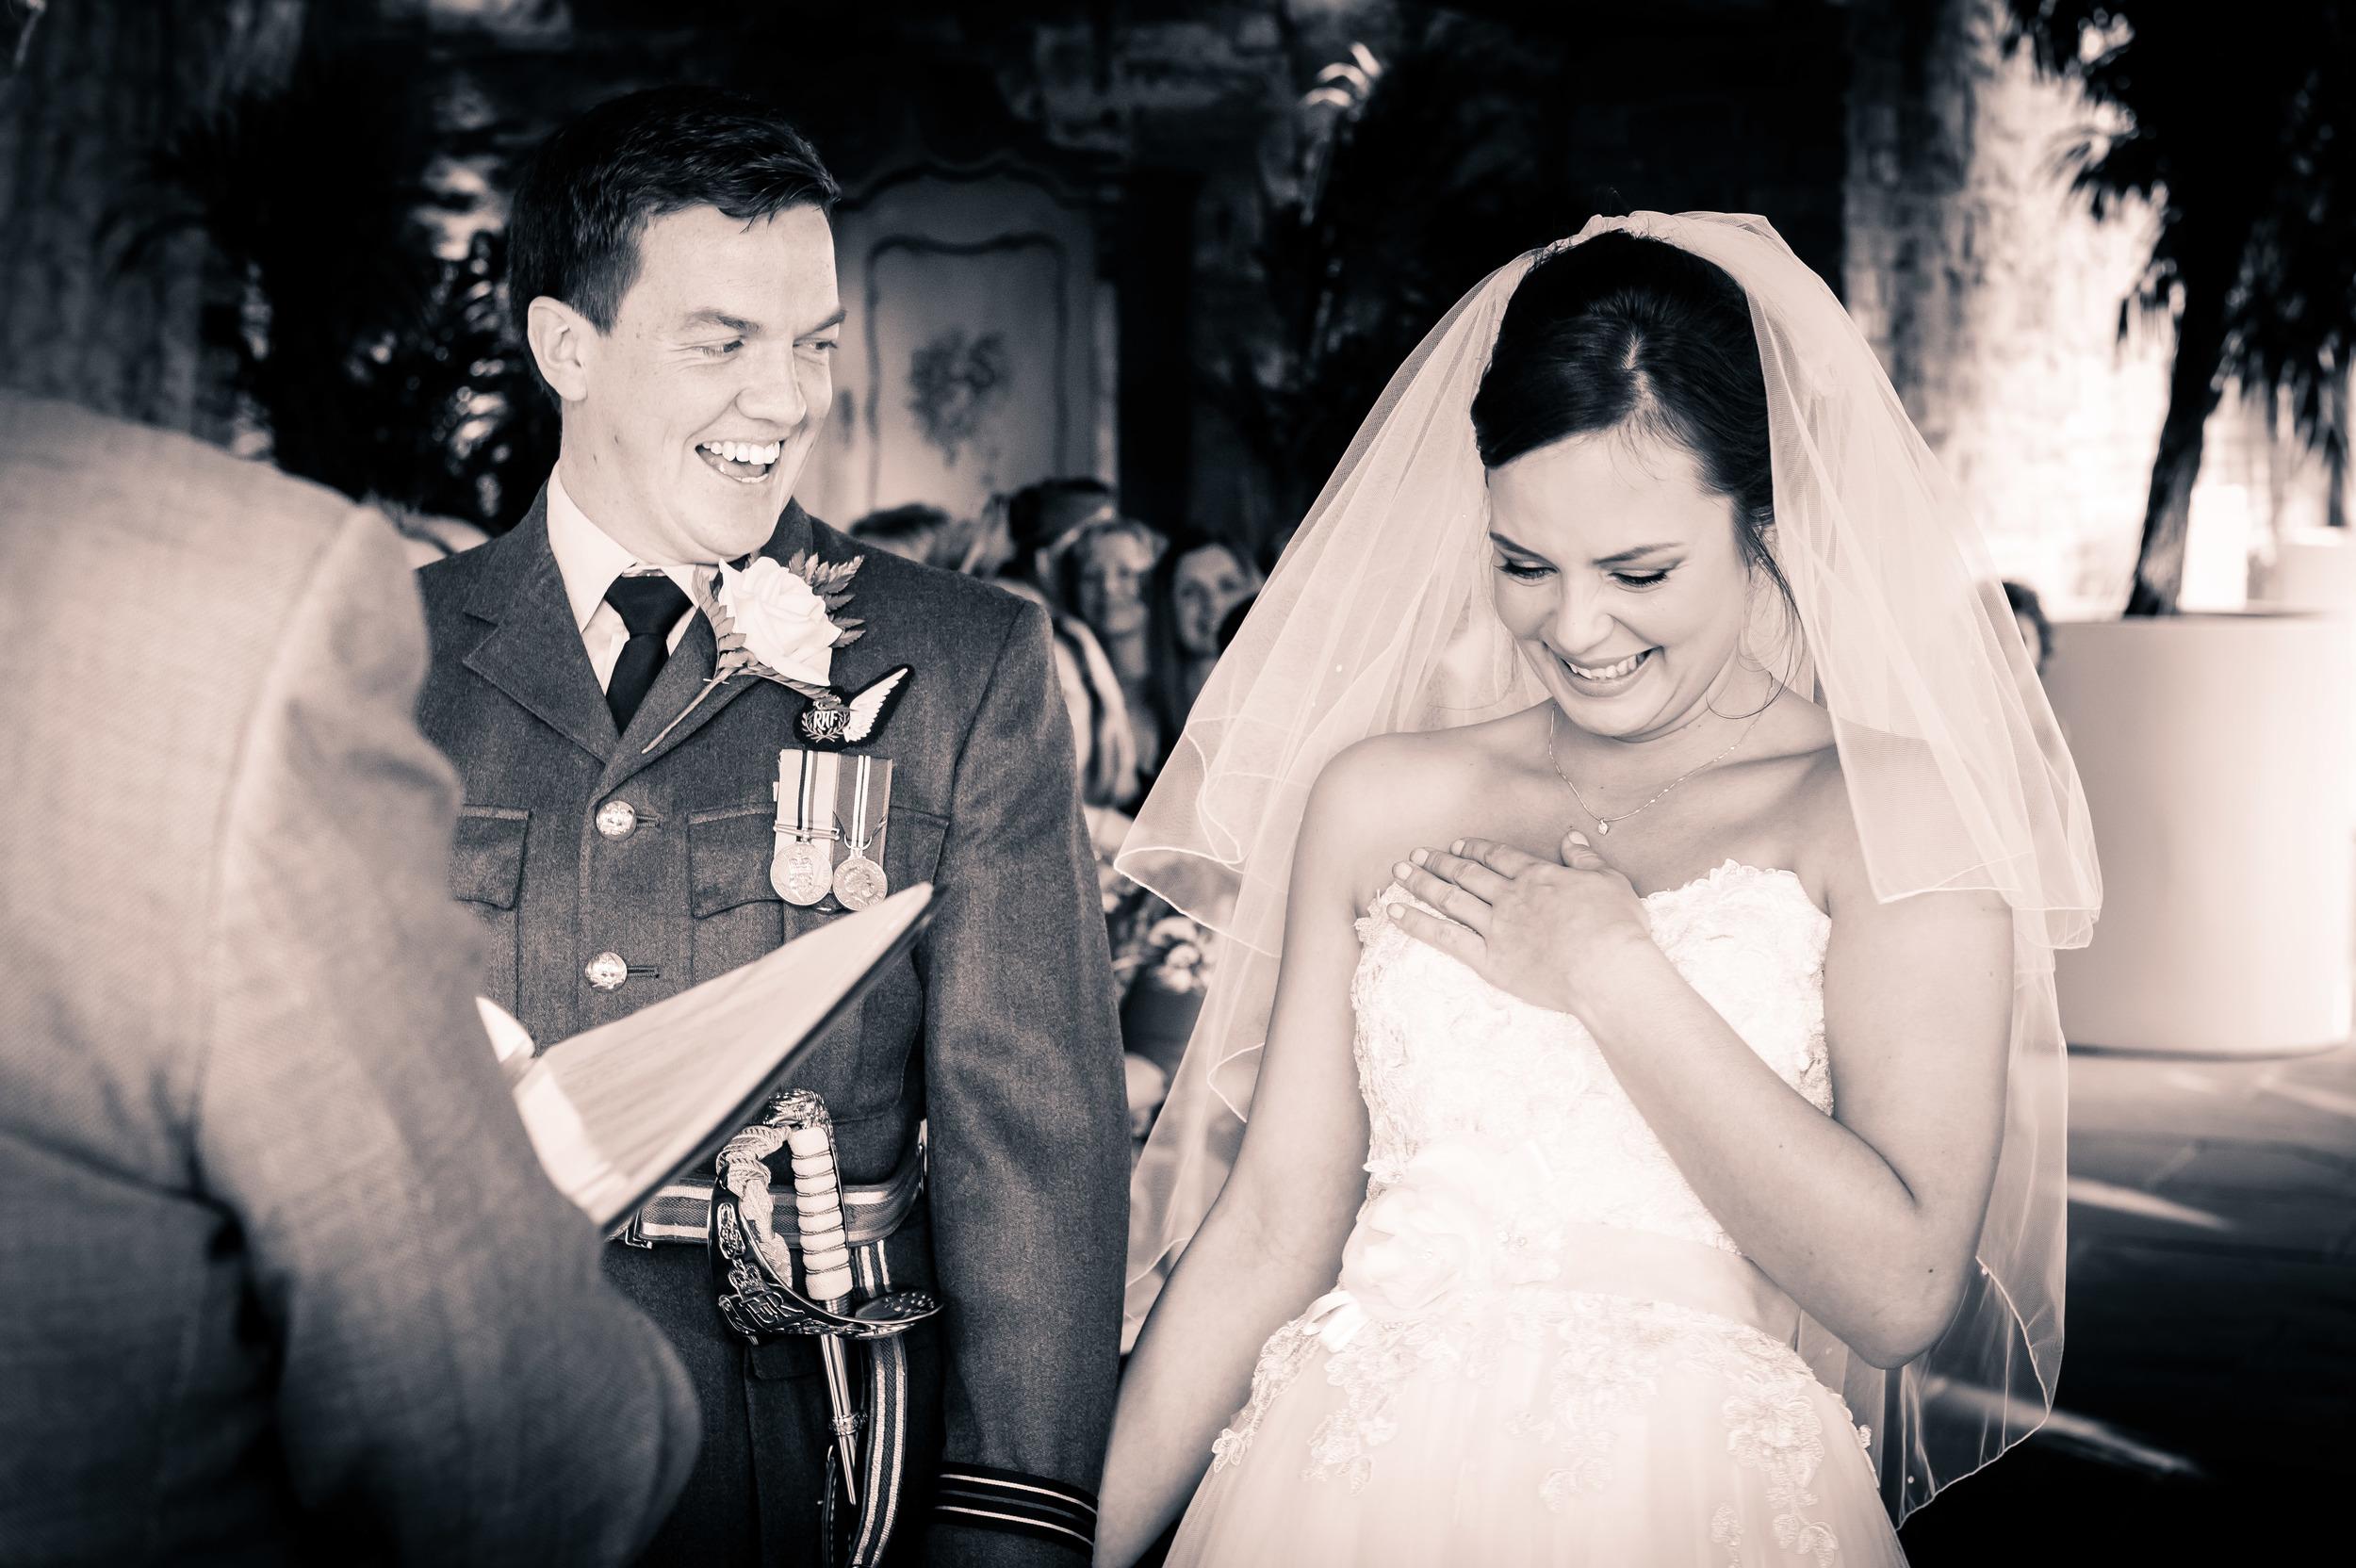 Newton Hall Wedding - Richard Perry Photography